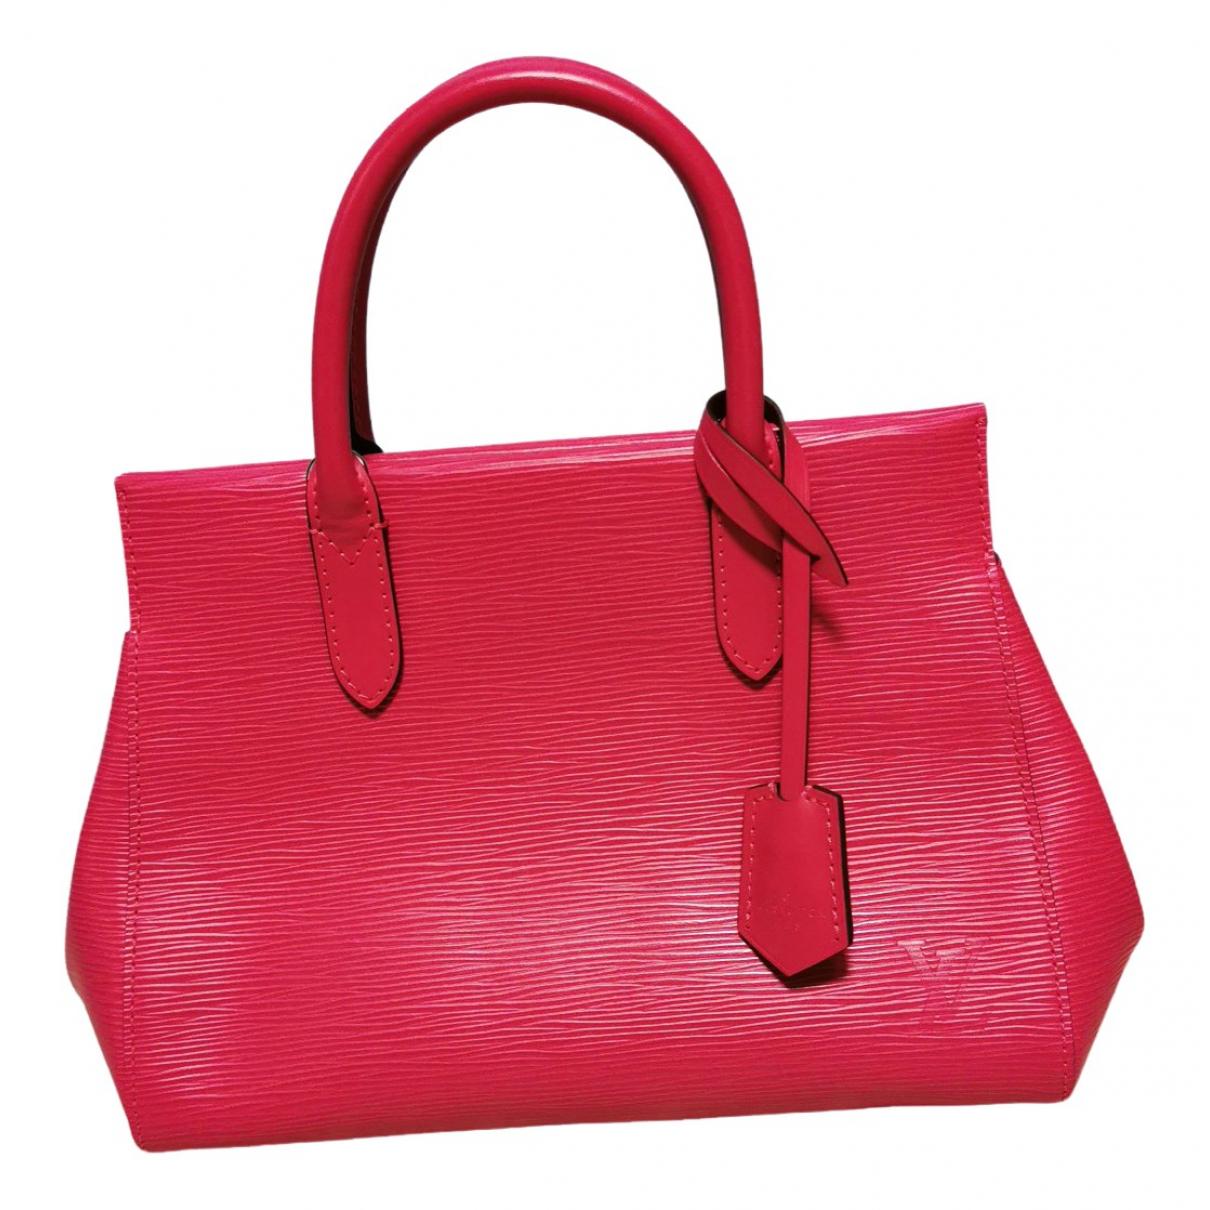 Louis Vuitton Marly Handtasche in  Rosa Leder